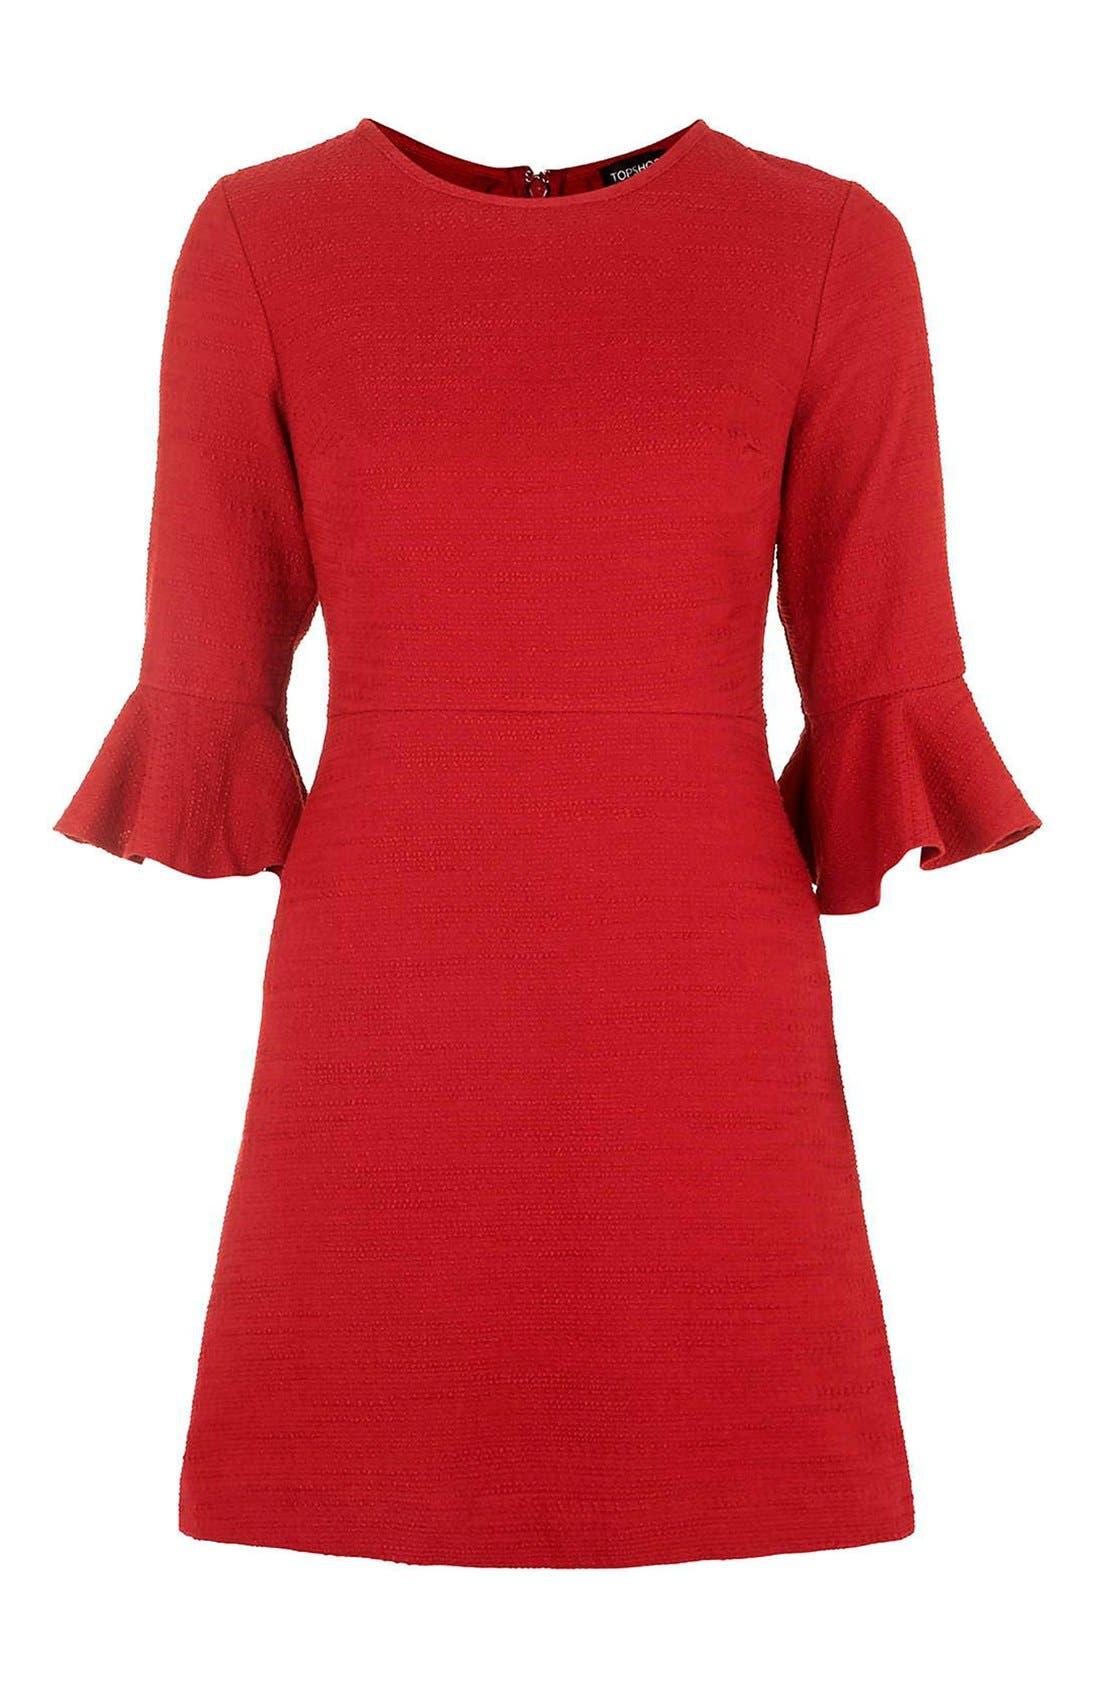 Alternate Image 3  - Topshop Fluted Sleeve Dress (Regular & Petite)